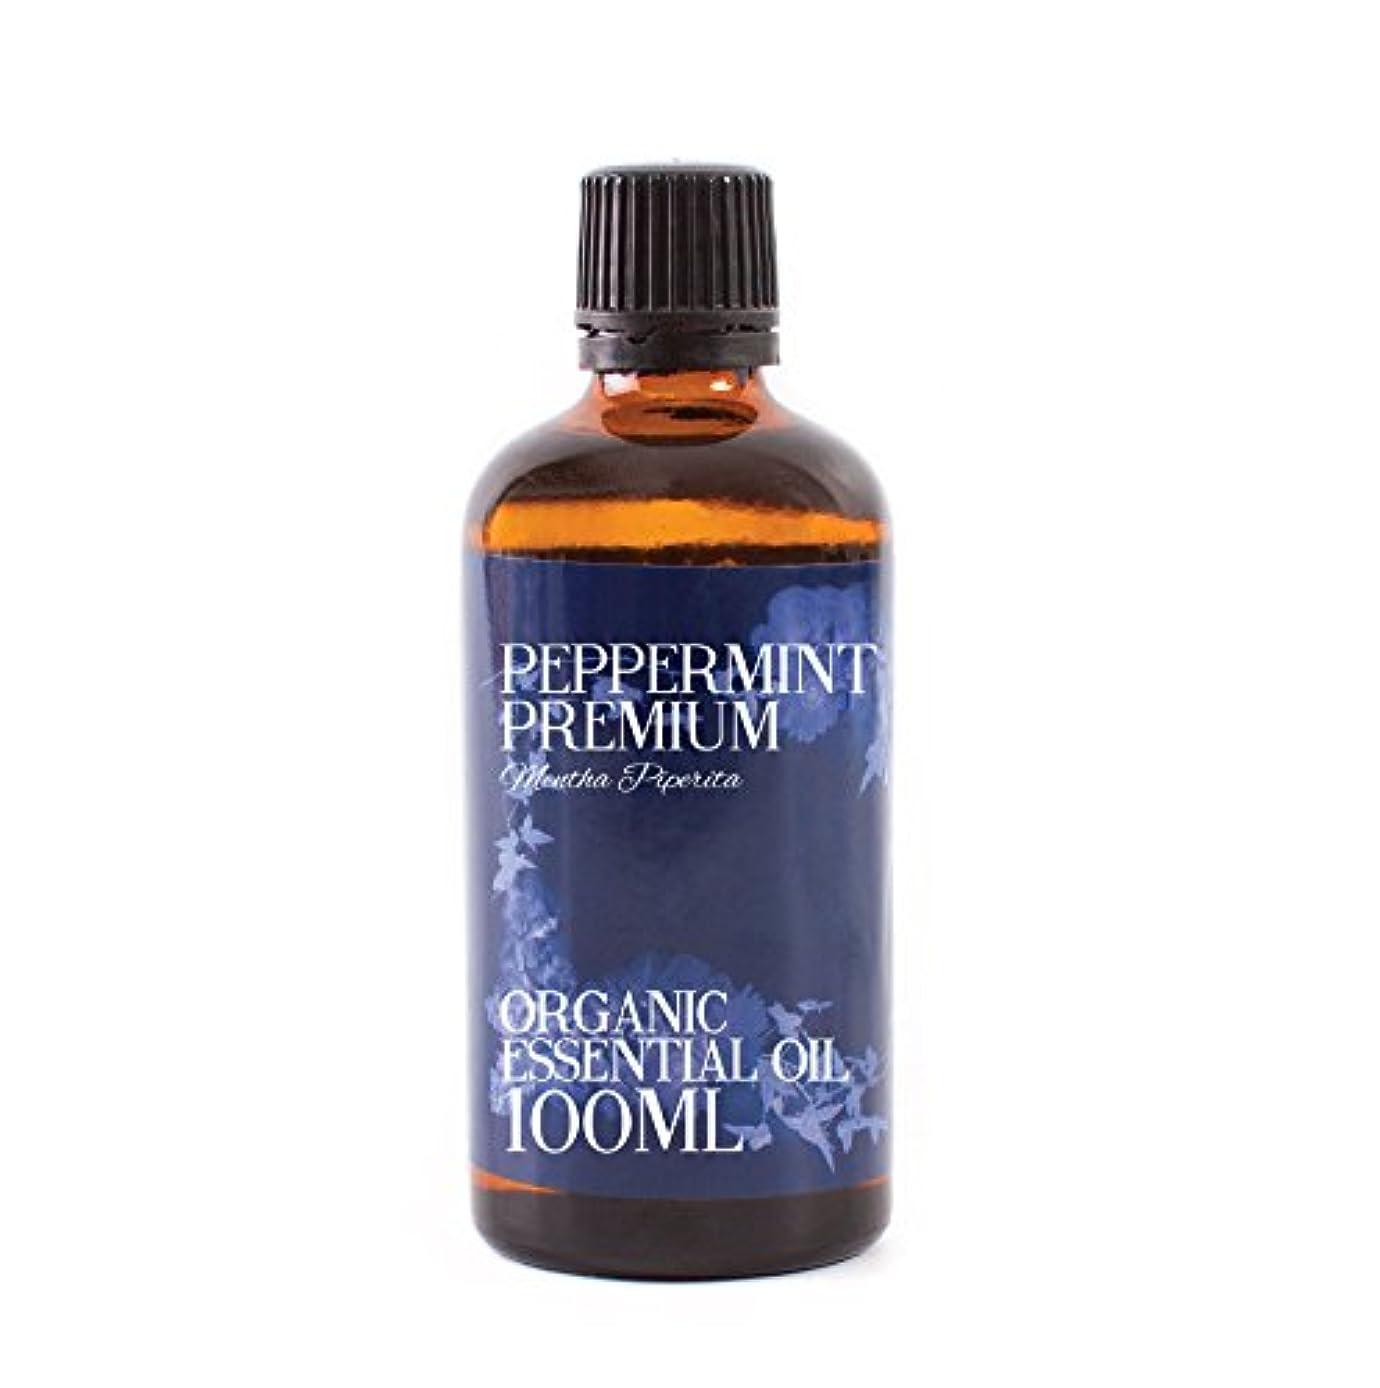 Mystic Moments | Peppermint Premium Organic Essential Oil - 100ml - 100% Pure